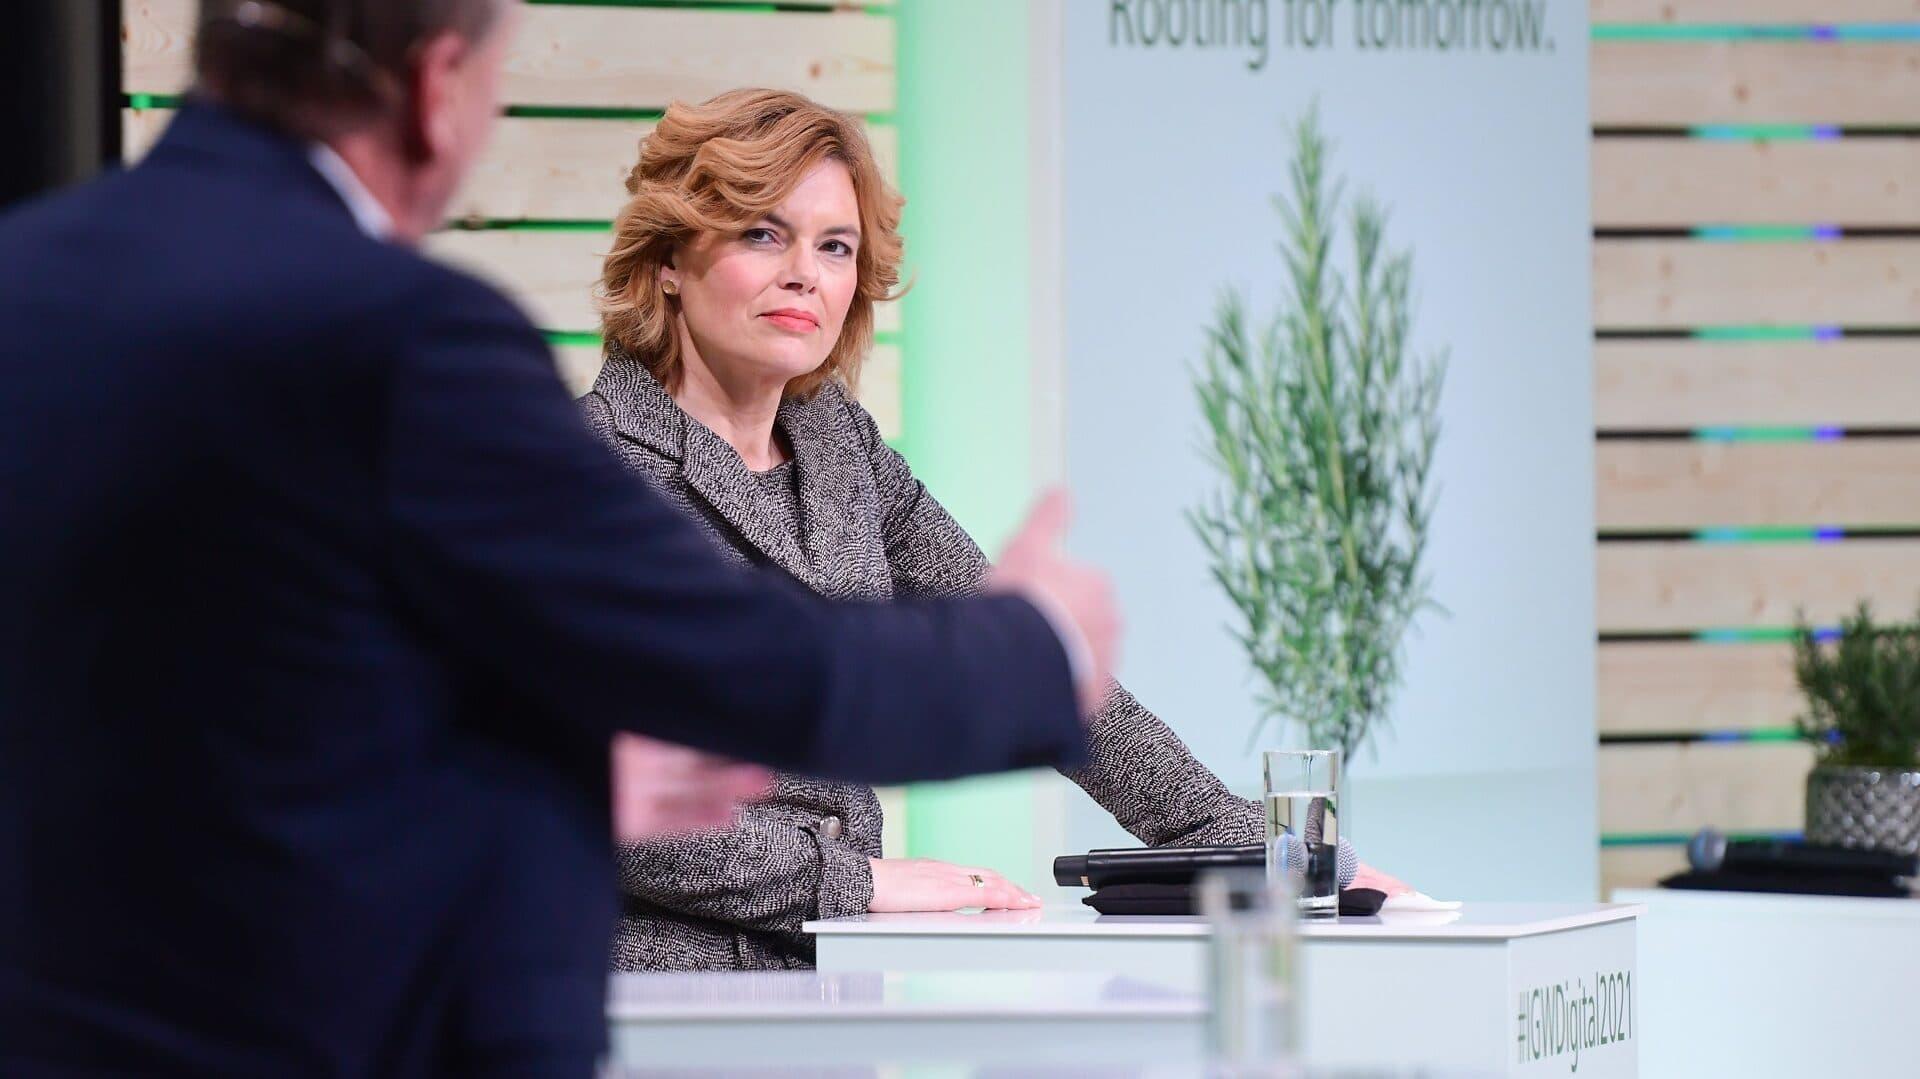 Julia Klöckner, Internationale Grüne Woche 2021